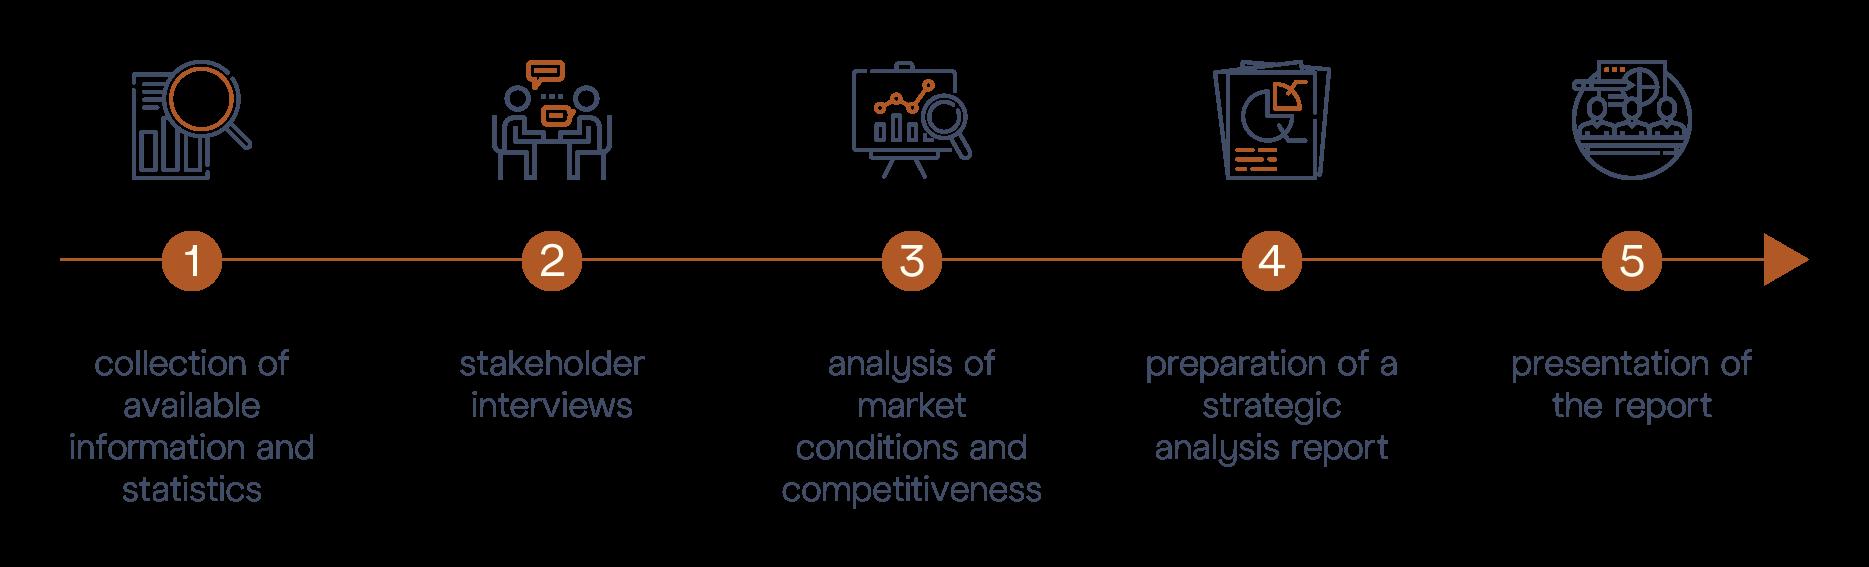 M&BD © Strategy Audit - Diagram Steps